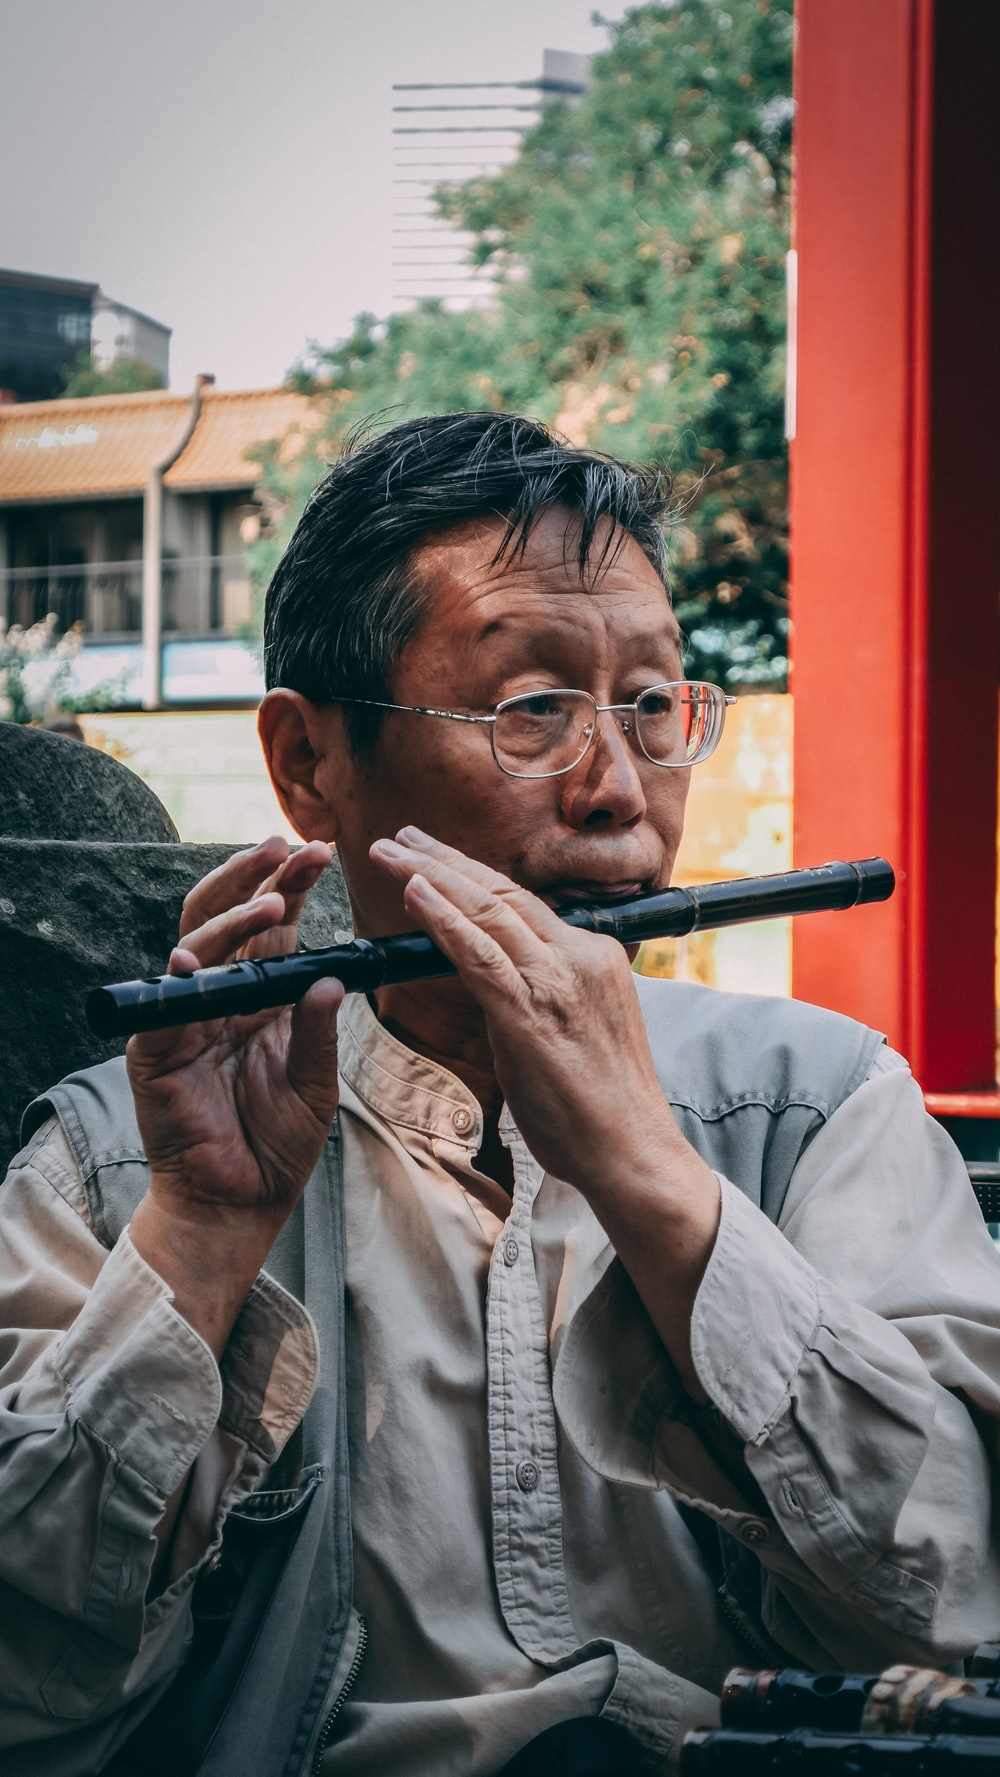 man playing black flute